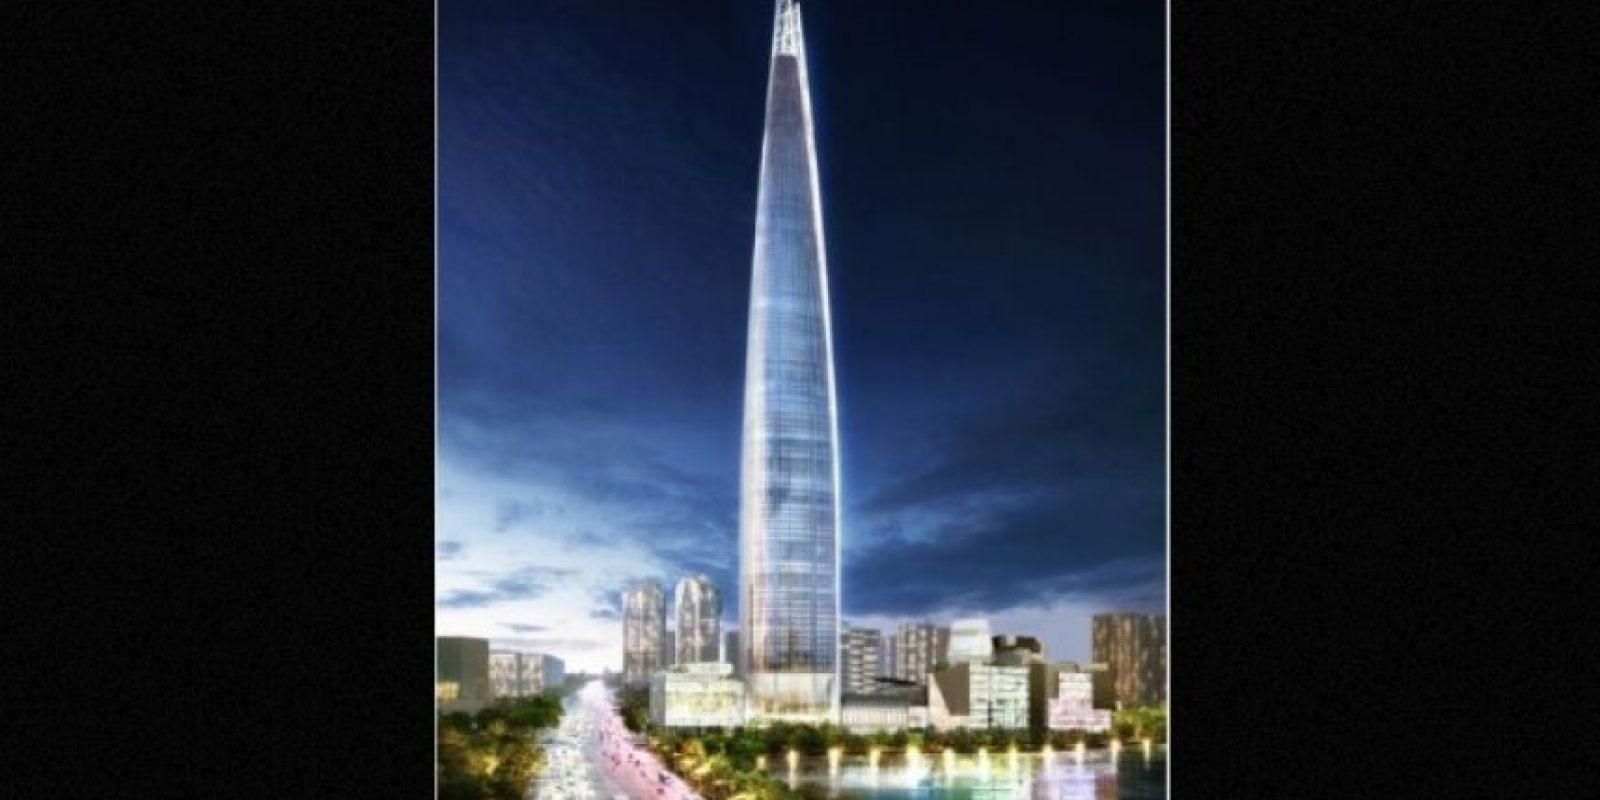 Será inaugurado en 2016 Foto:Kohn Pedersen – Skyscrapercenter.com